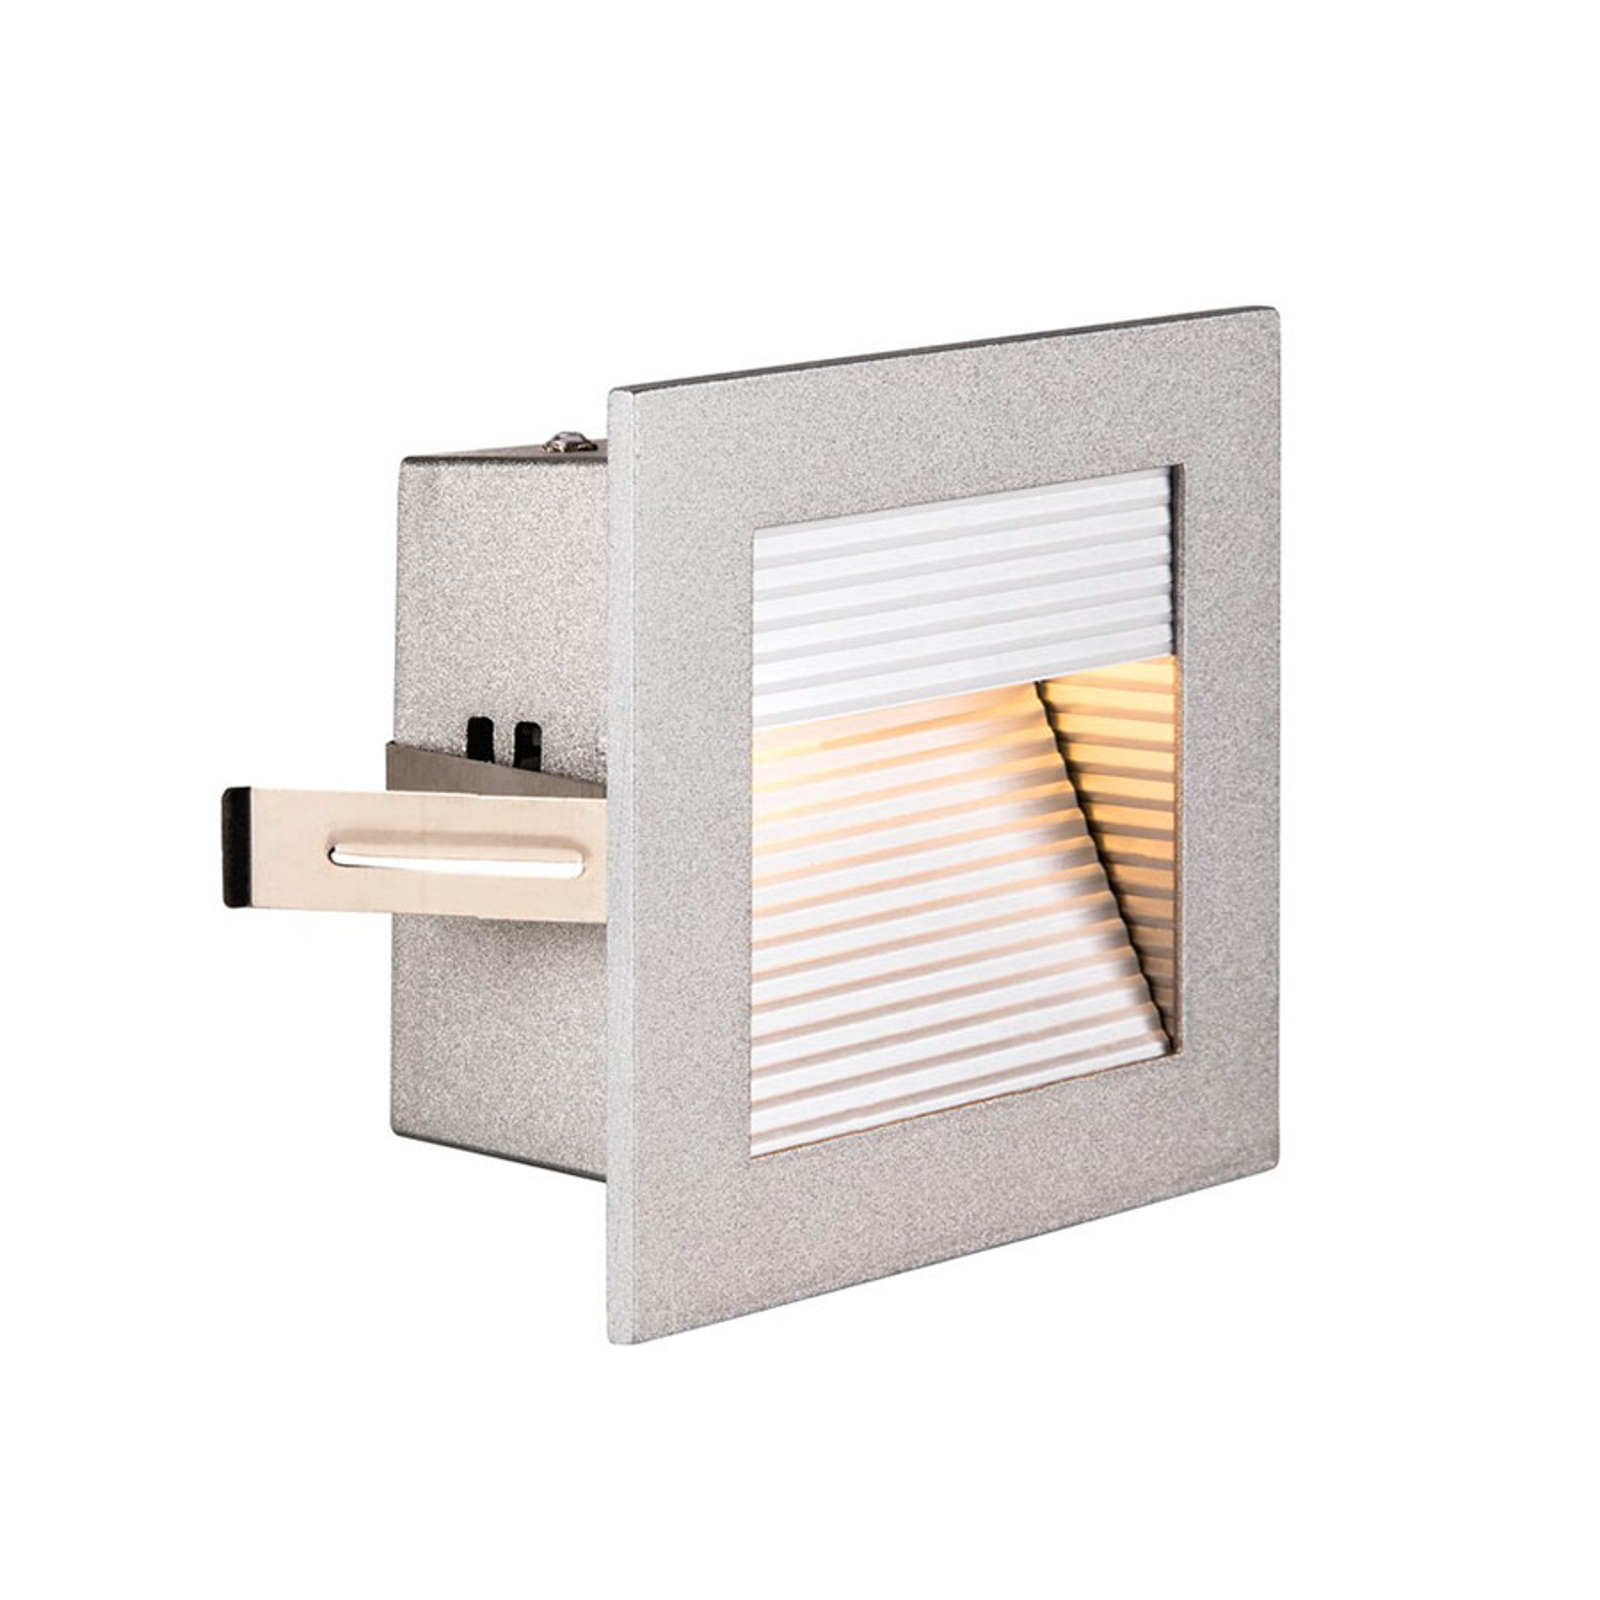 SLV Frame Curve LED-Einbauleuchte silber